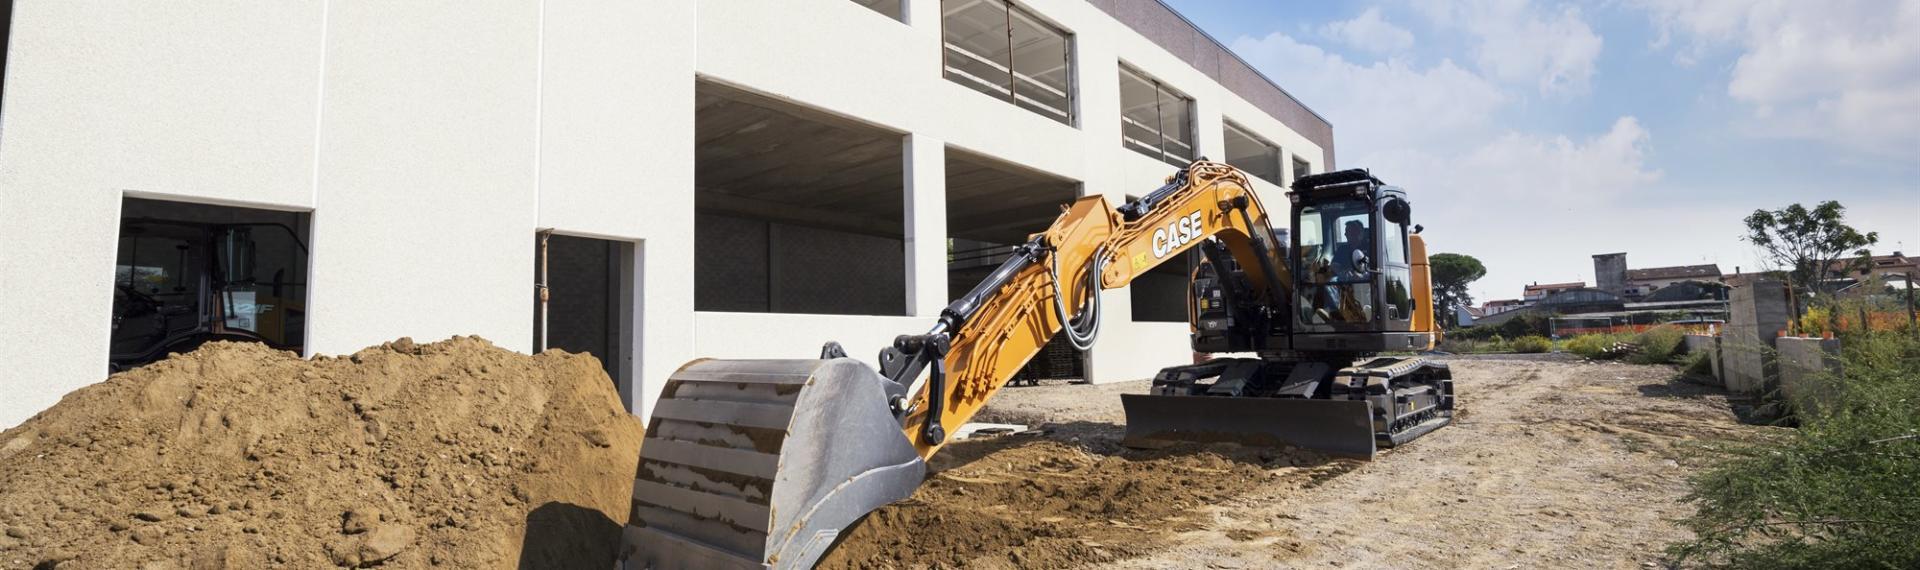 CASE CX145D Excavator Digger